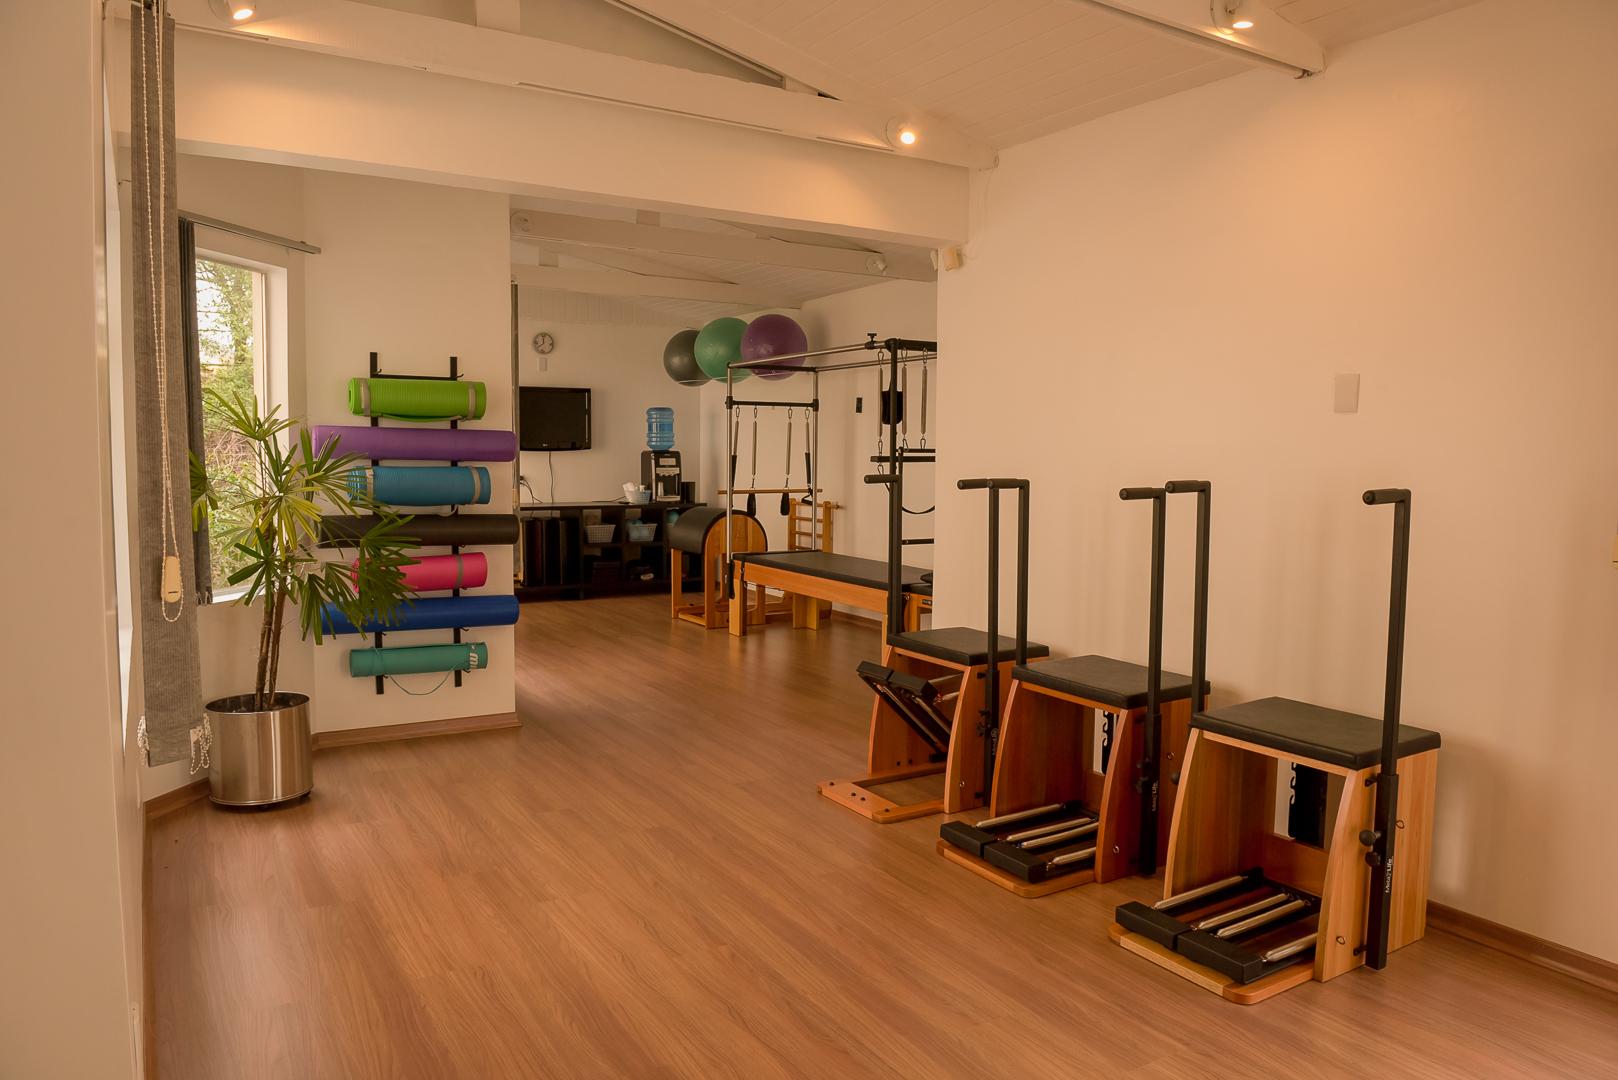 sala-pilates-aparelhos